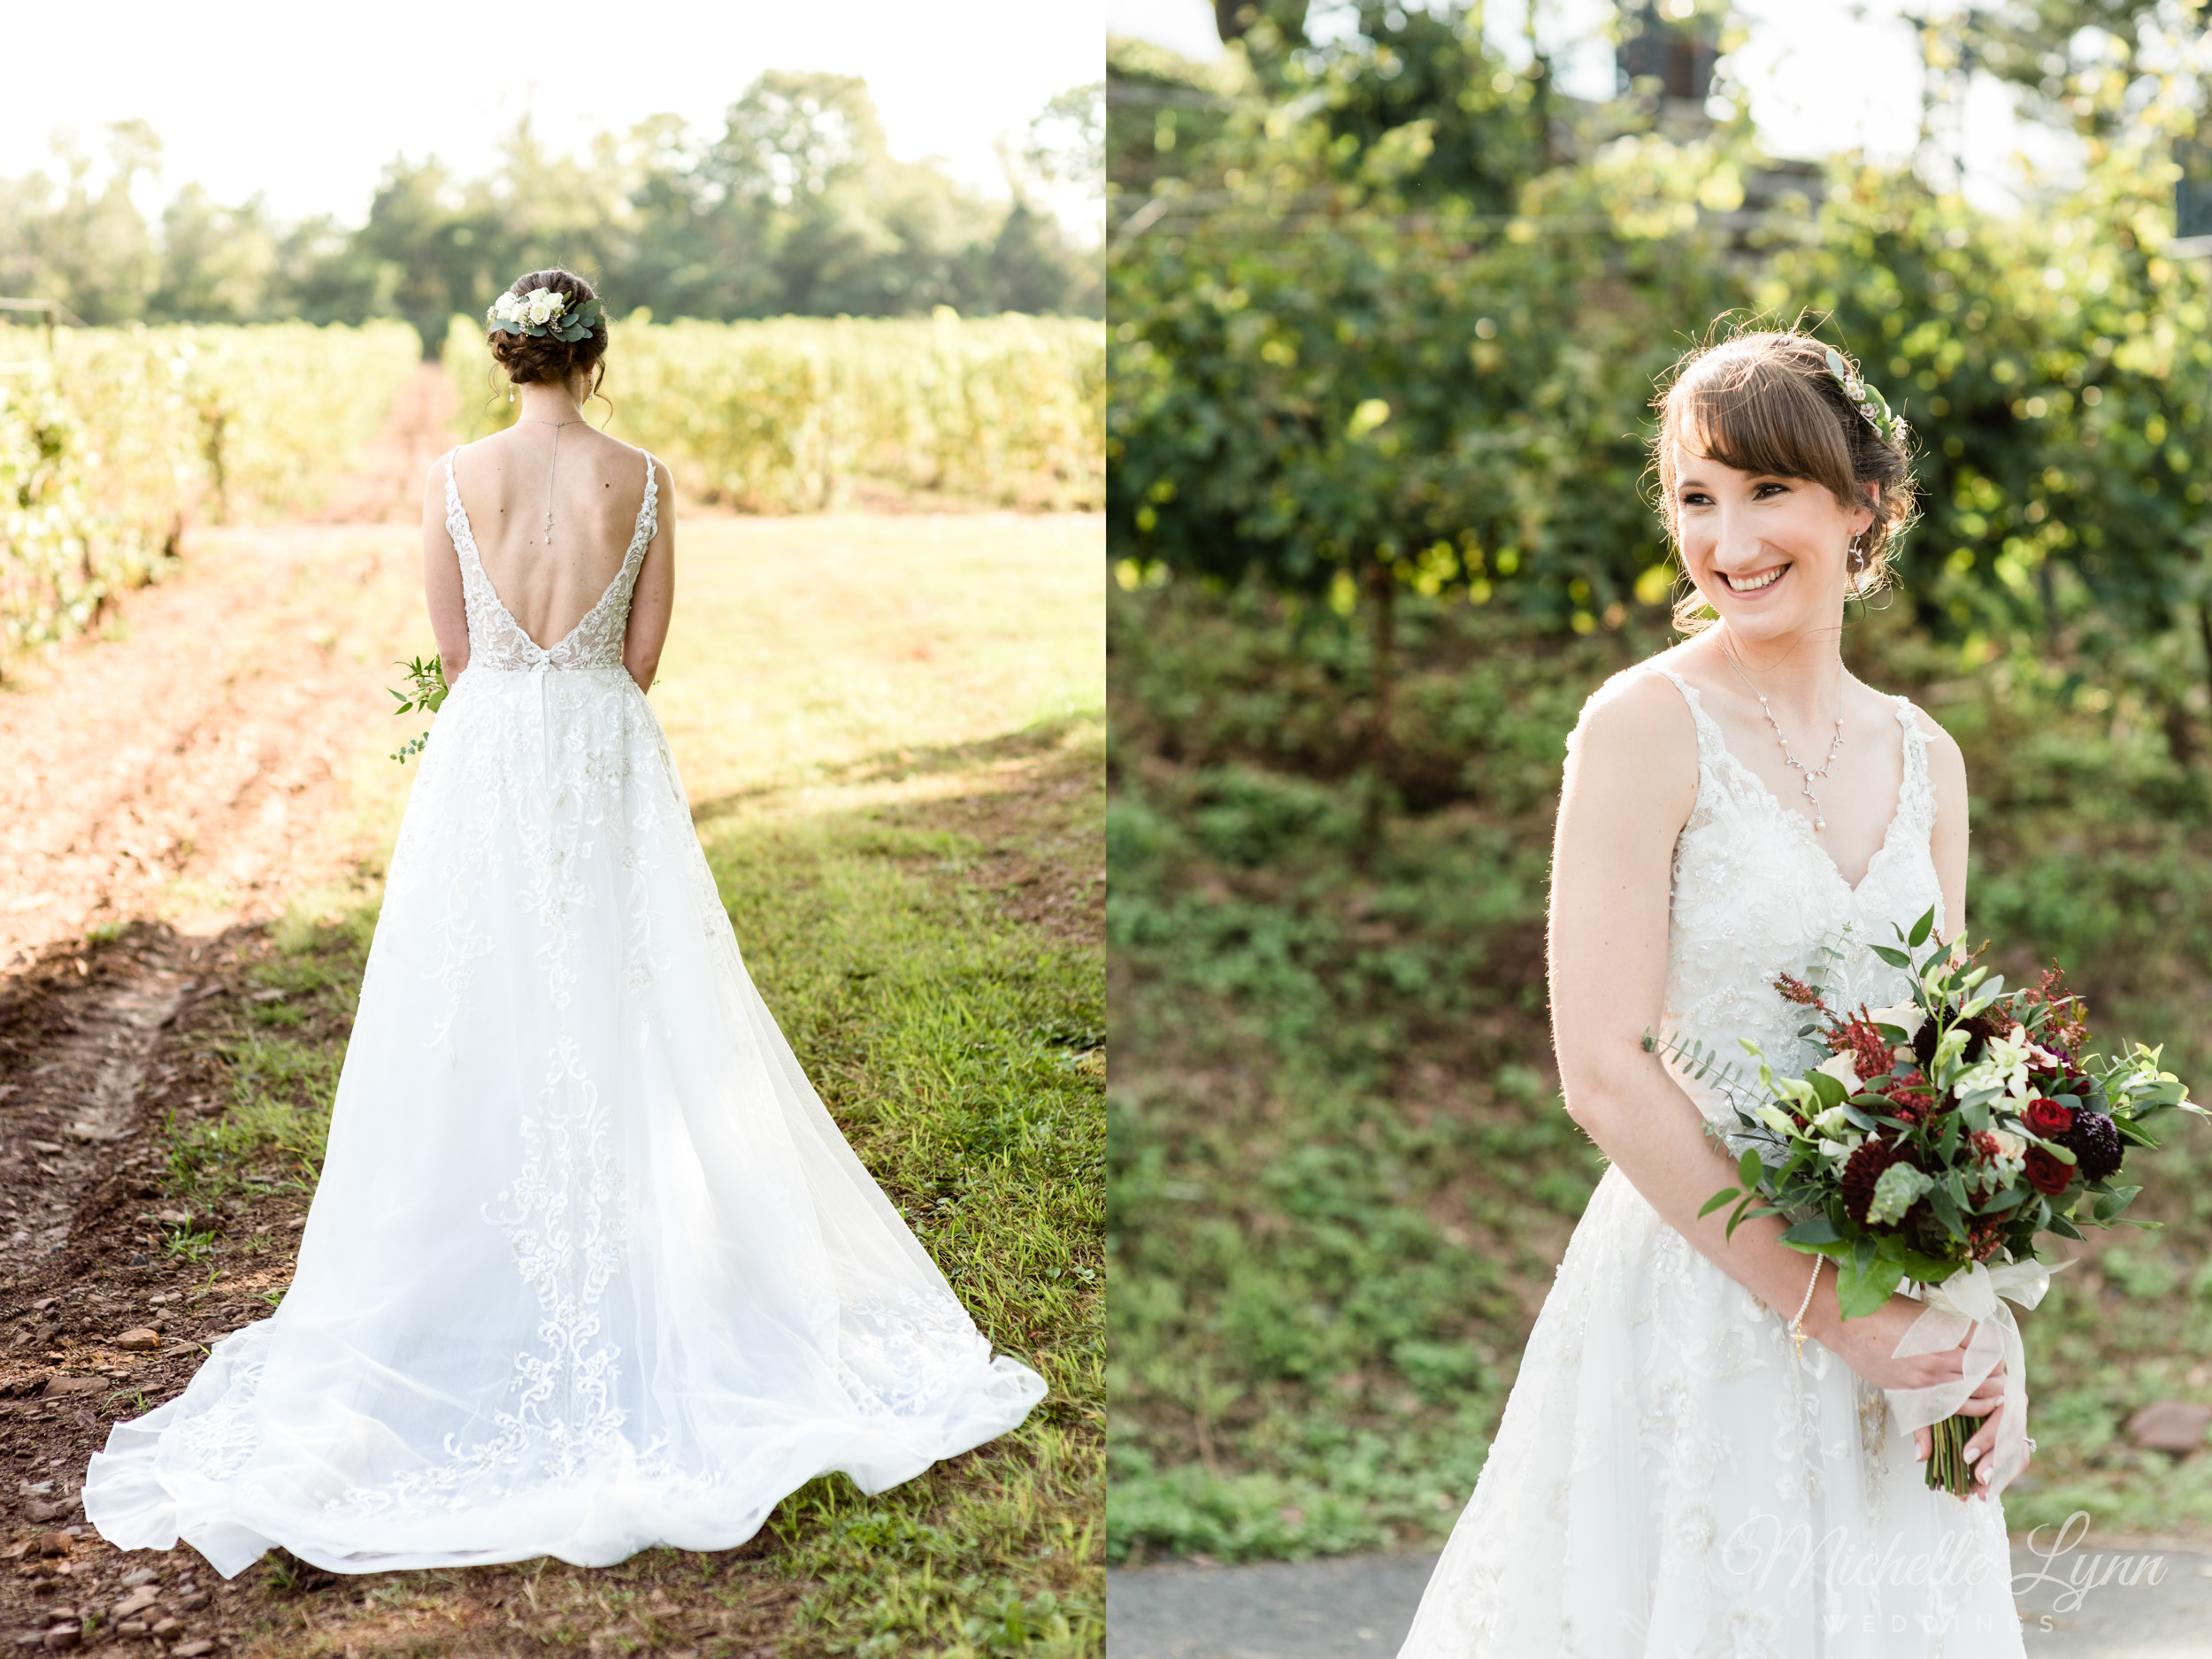 sand-castle-winery-pennsylvania-wedding-photography-39.jpg